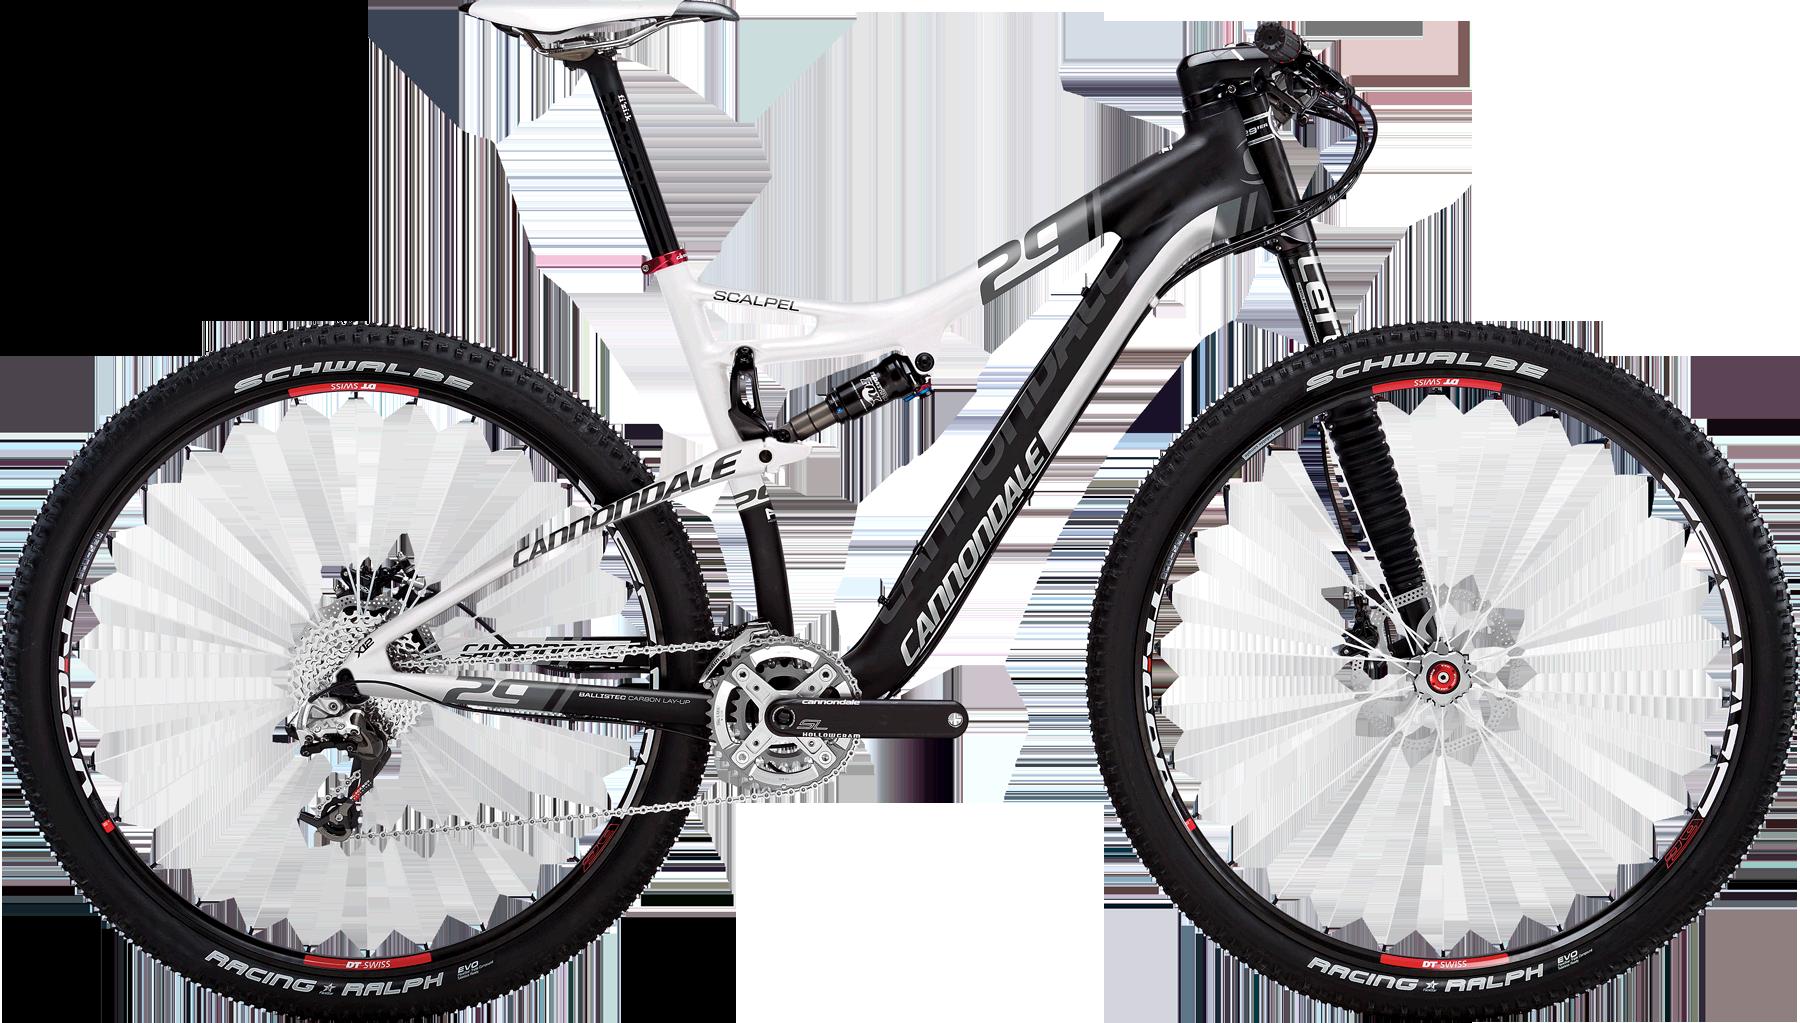 Cannondale Scalpel 29 Er Carbon 1 7 600 Msrp Such A Sick Bike